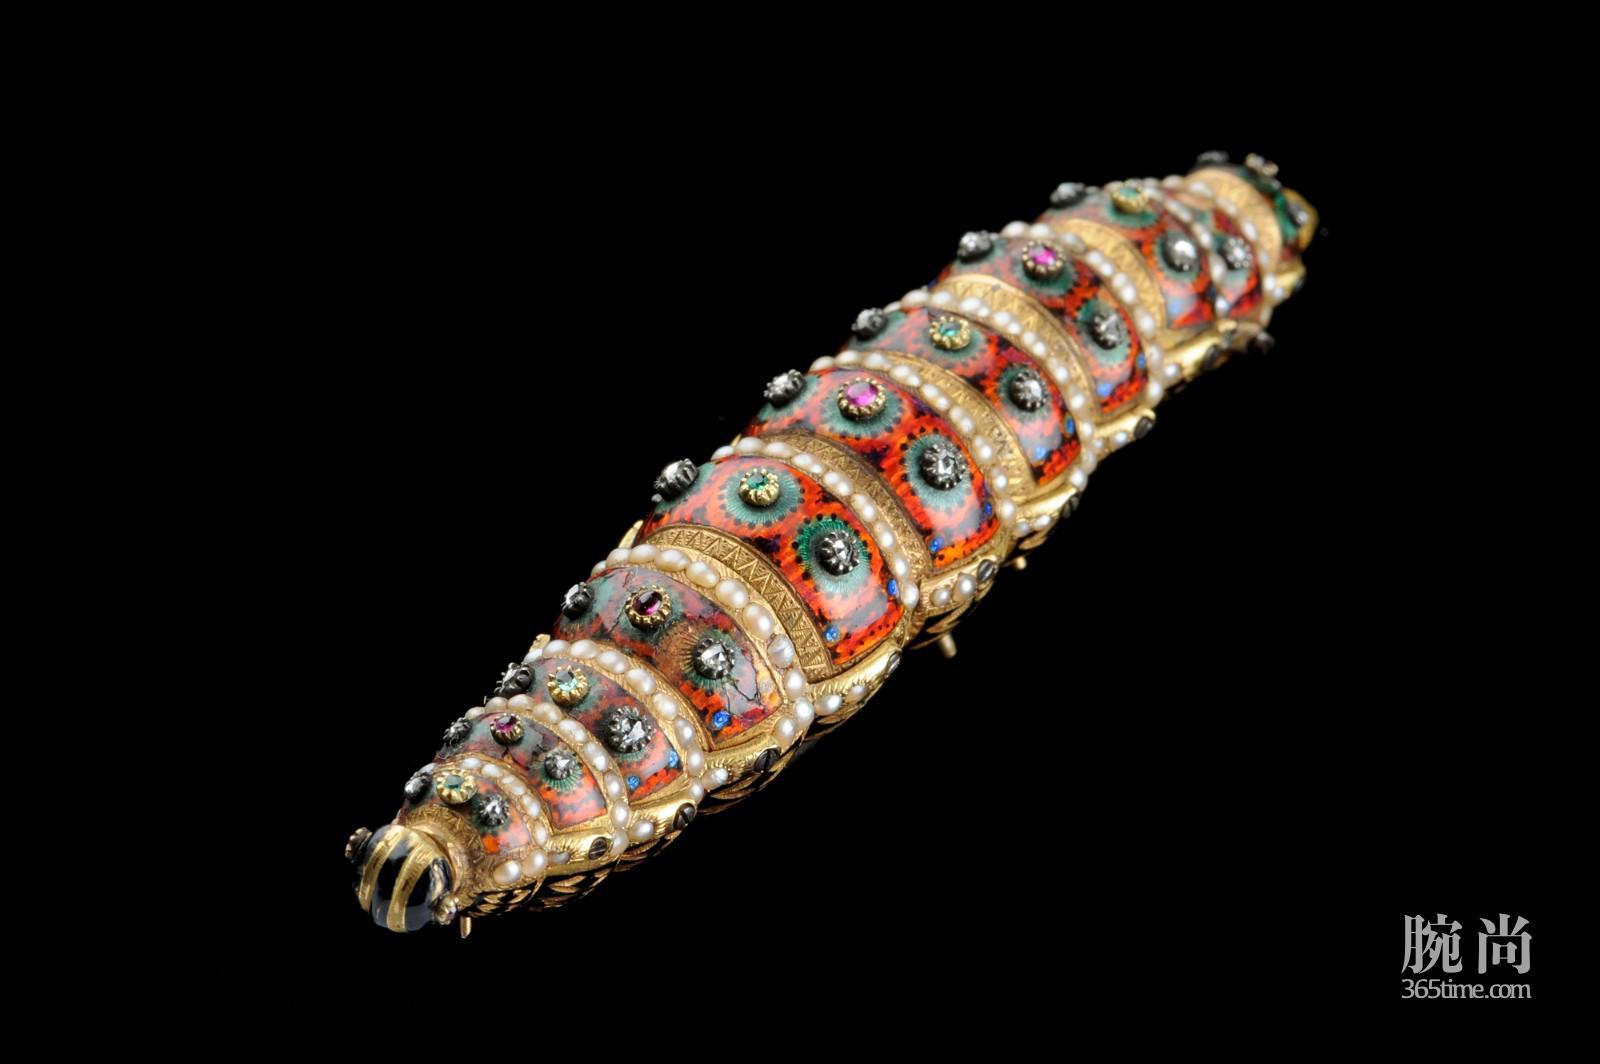 pictures-hi-res-the-silkworm-5_1.jpg